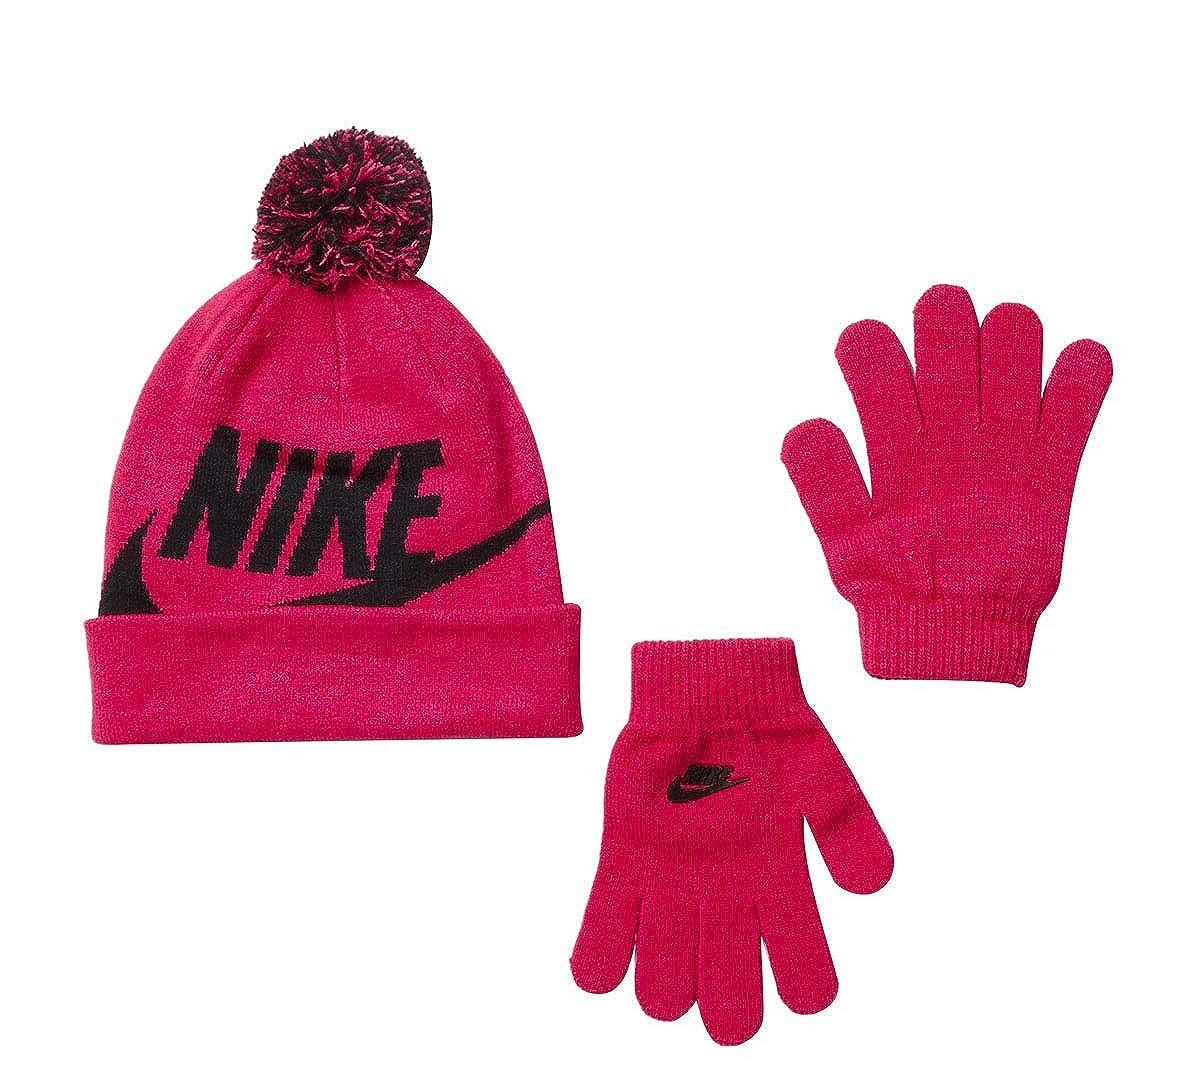 9fb722c36 Kids' Nike Swoosh Pom Beanie Hat and Gloves Set